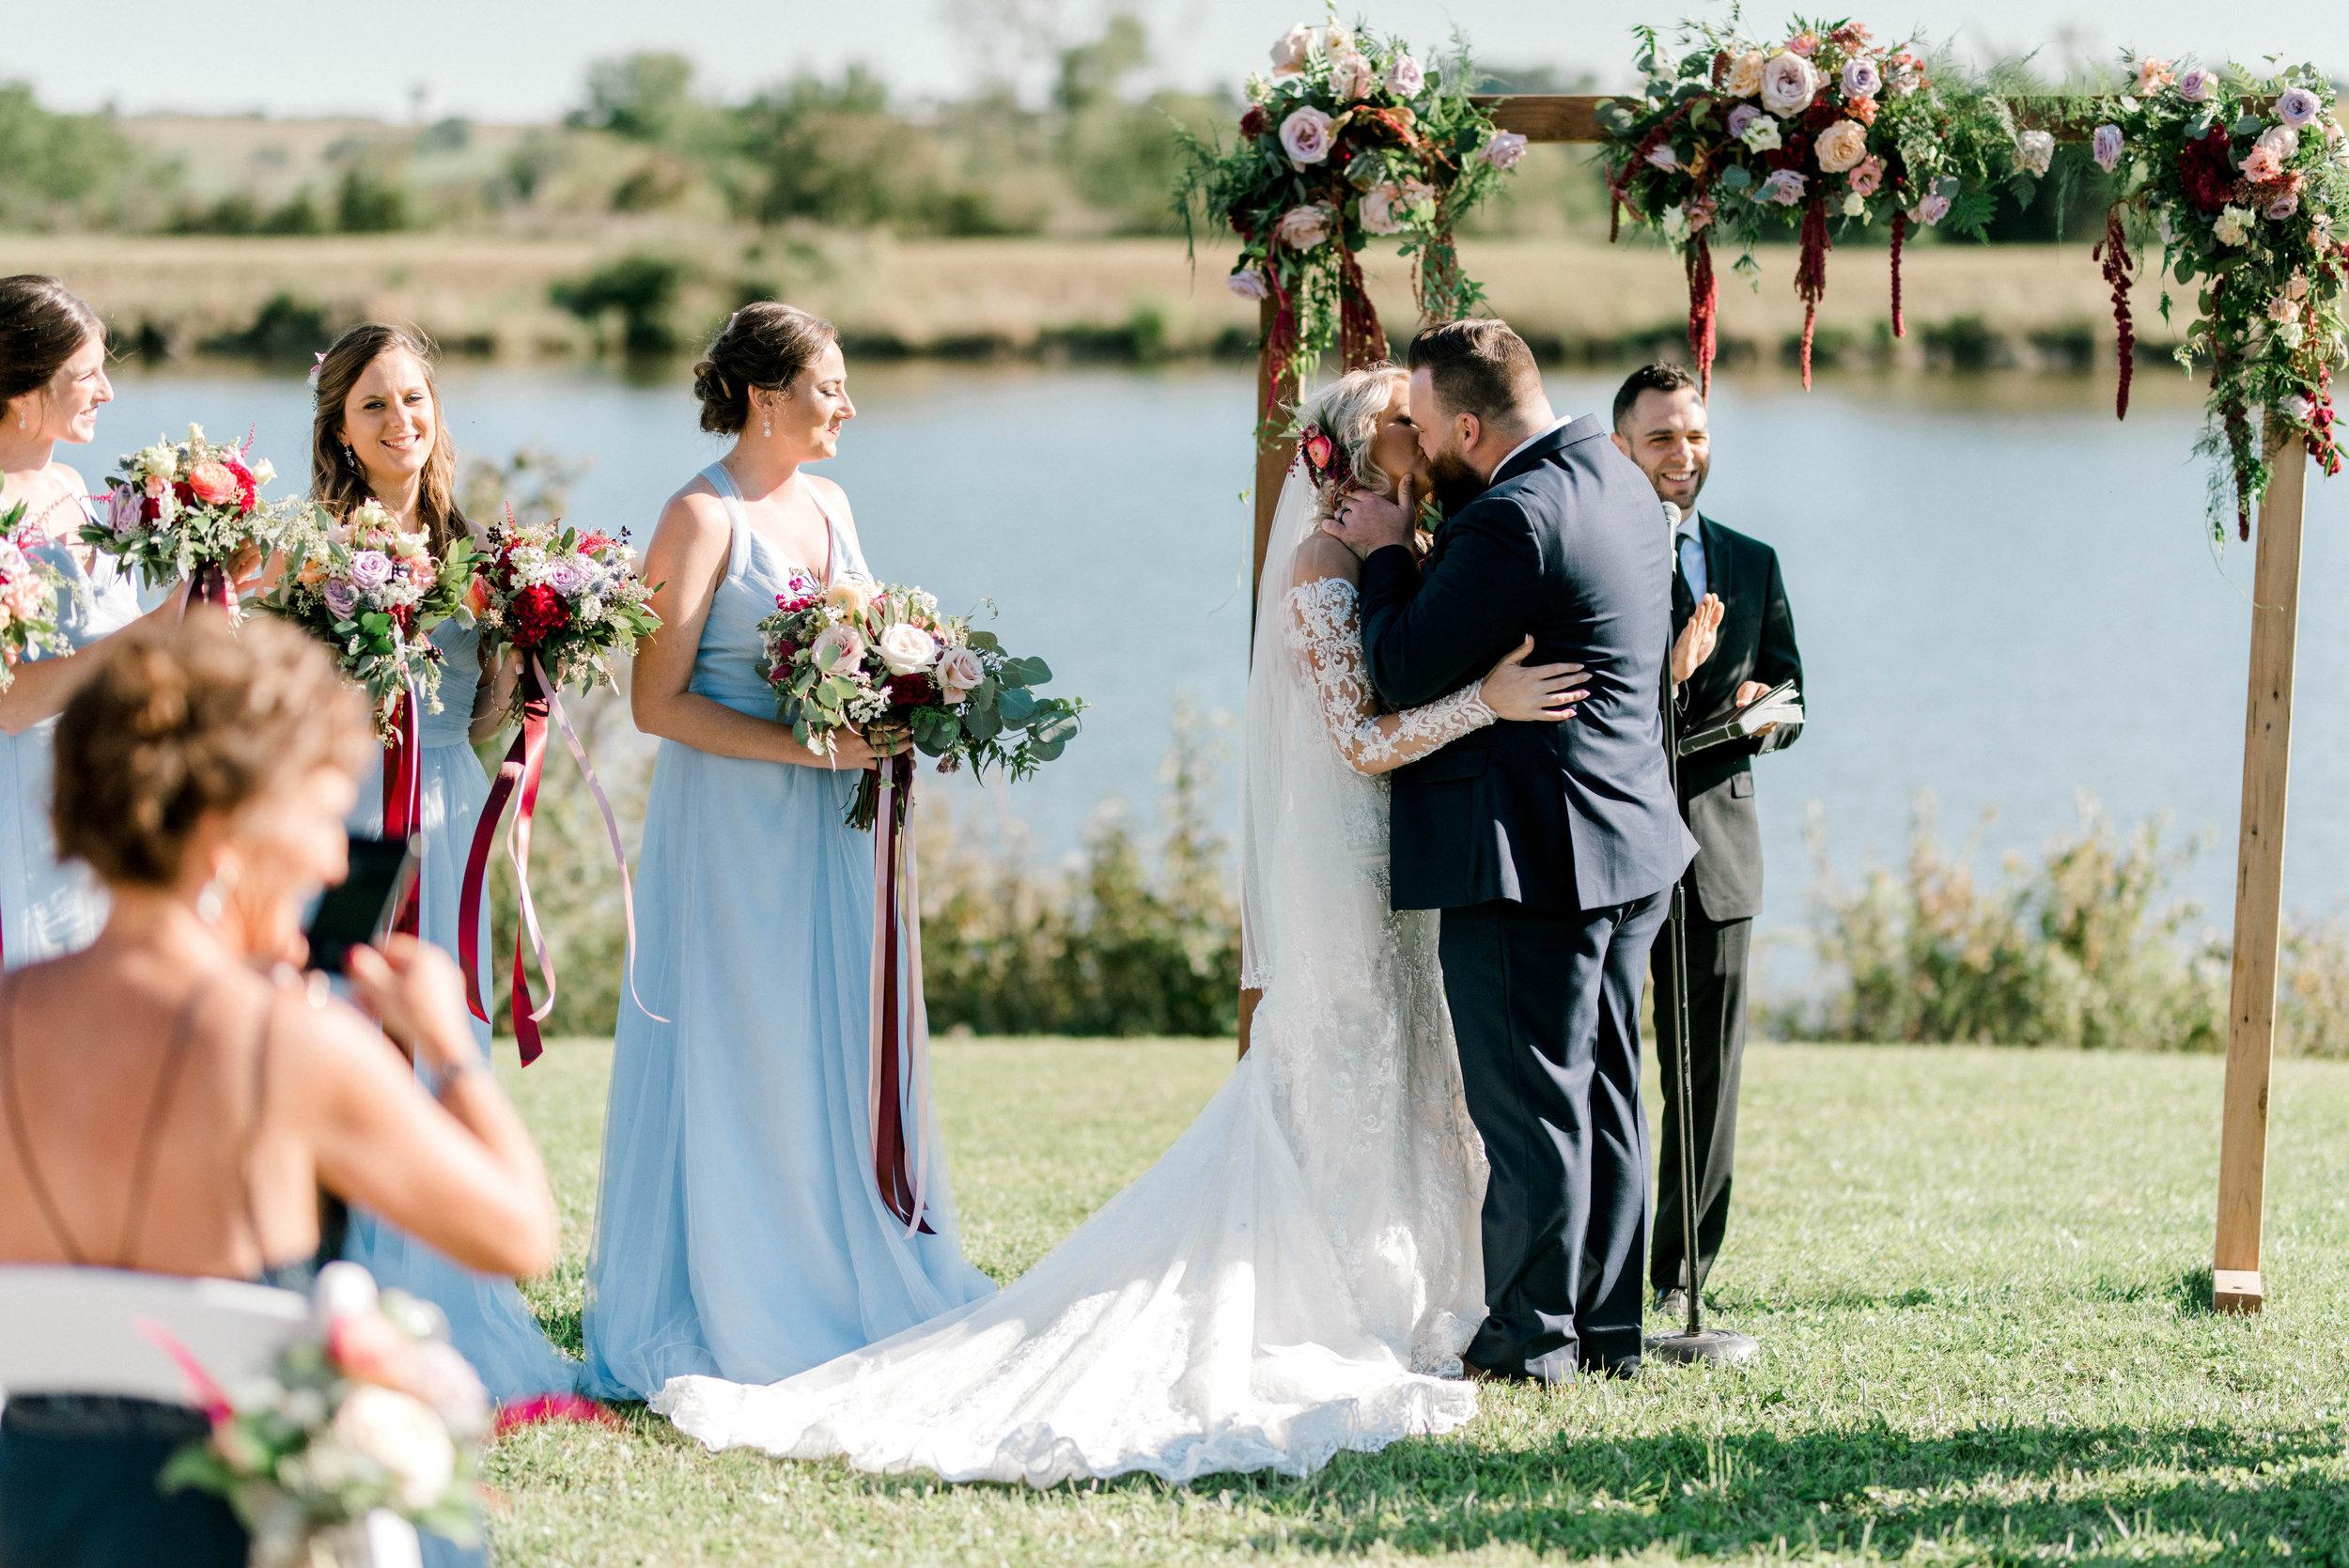 Ryan Alexa Married-Formals Ceremony-0185.jpg